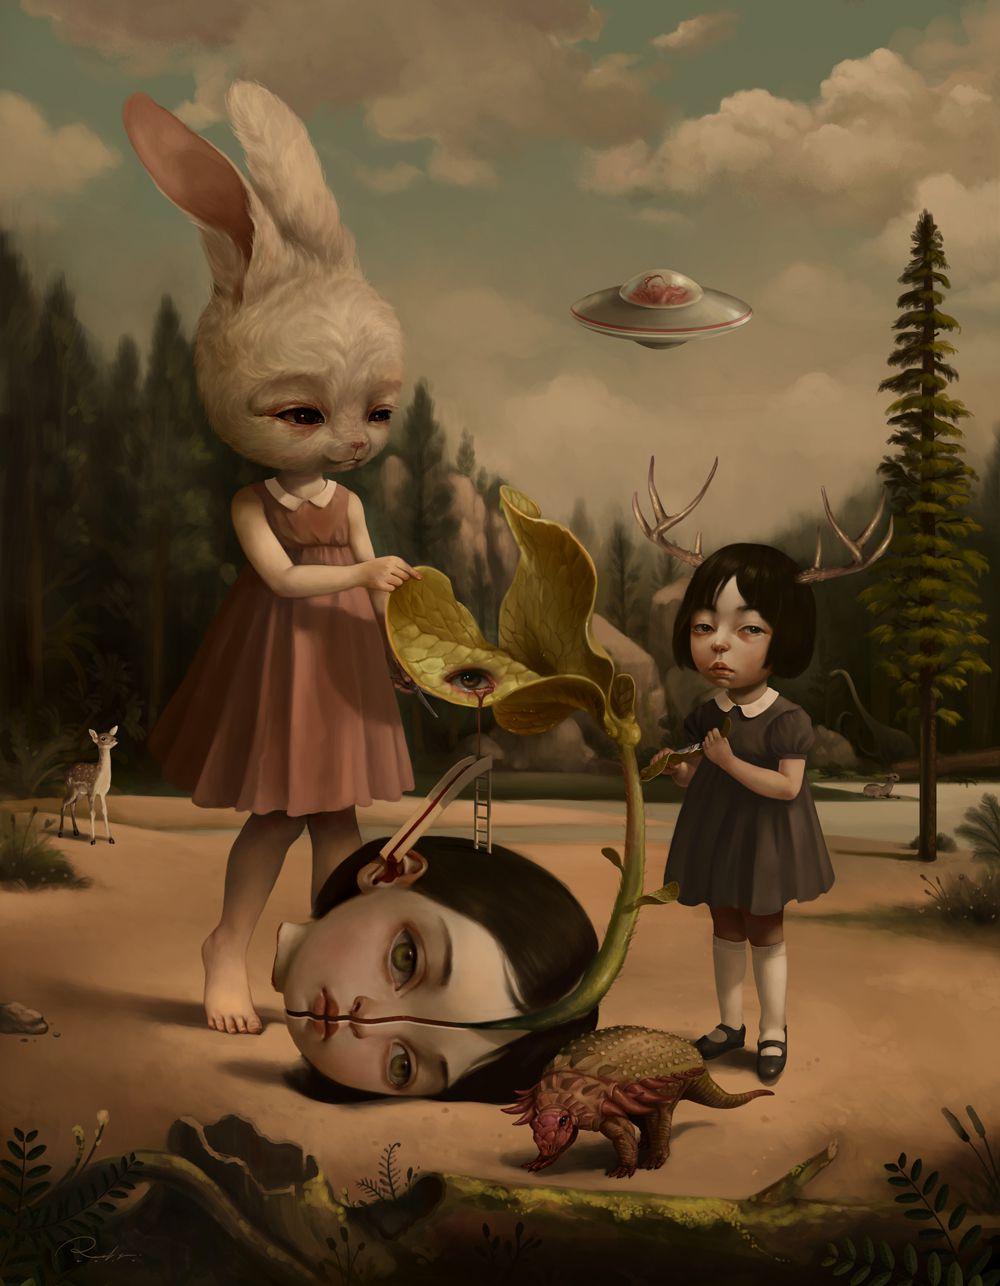 Graciously Bizarre Dark Surrealist Illustrations By Roby Dwi Antono 6